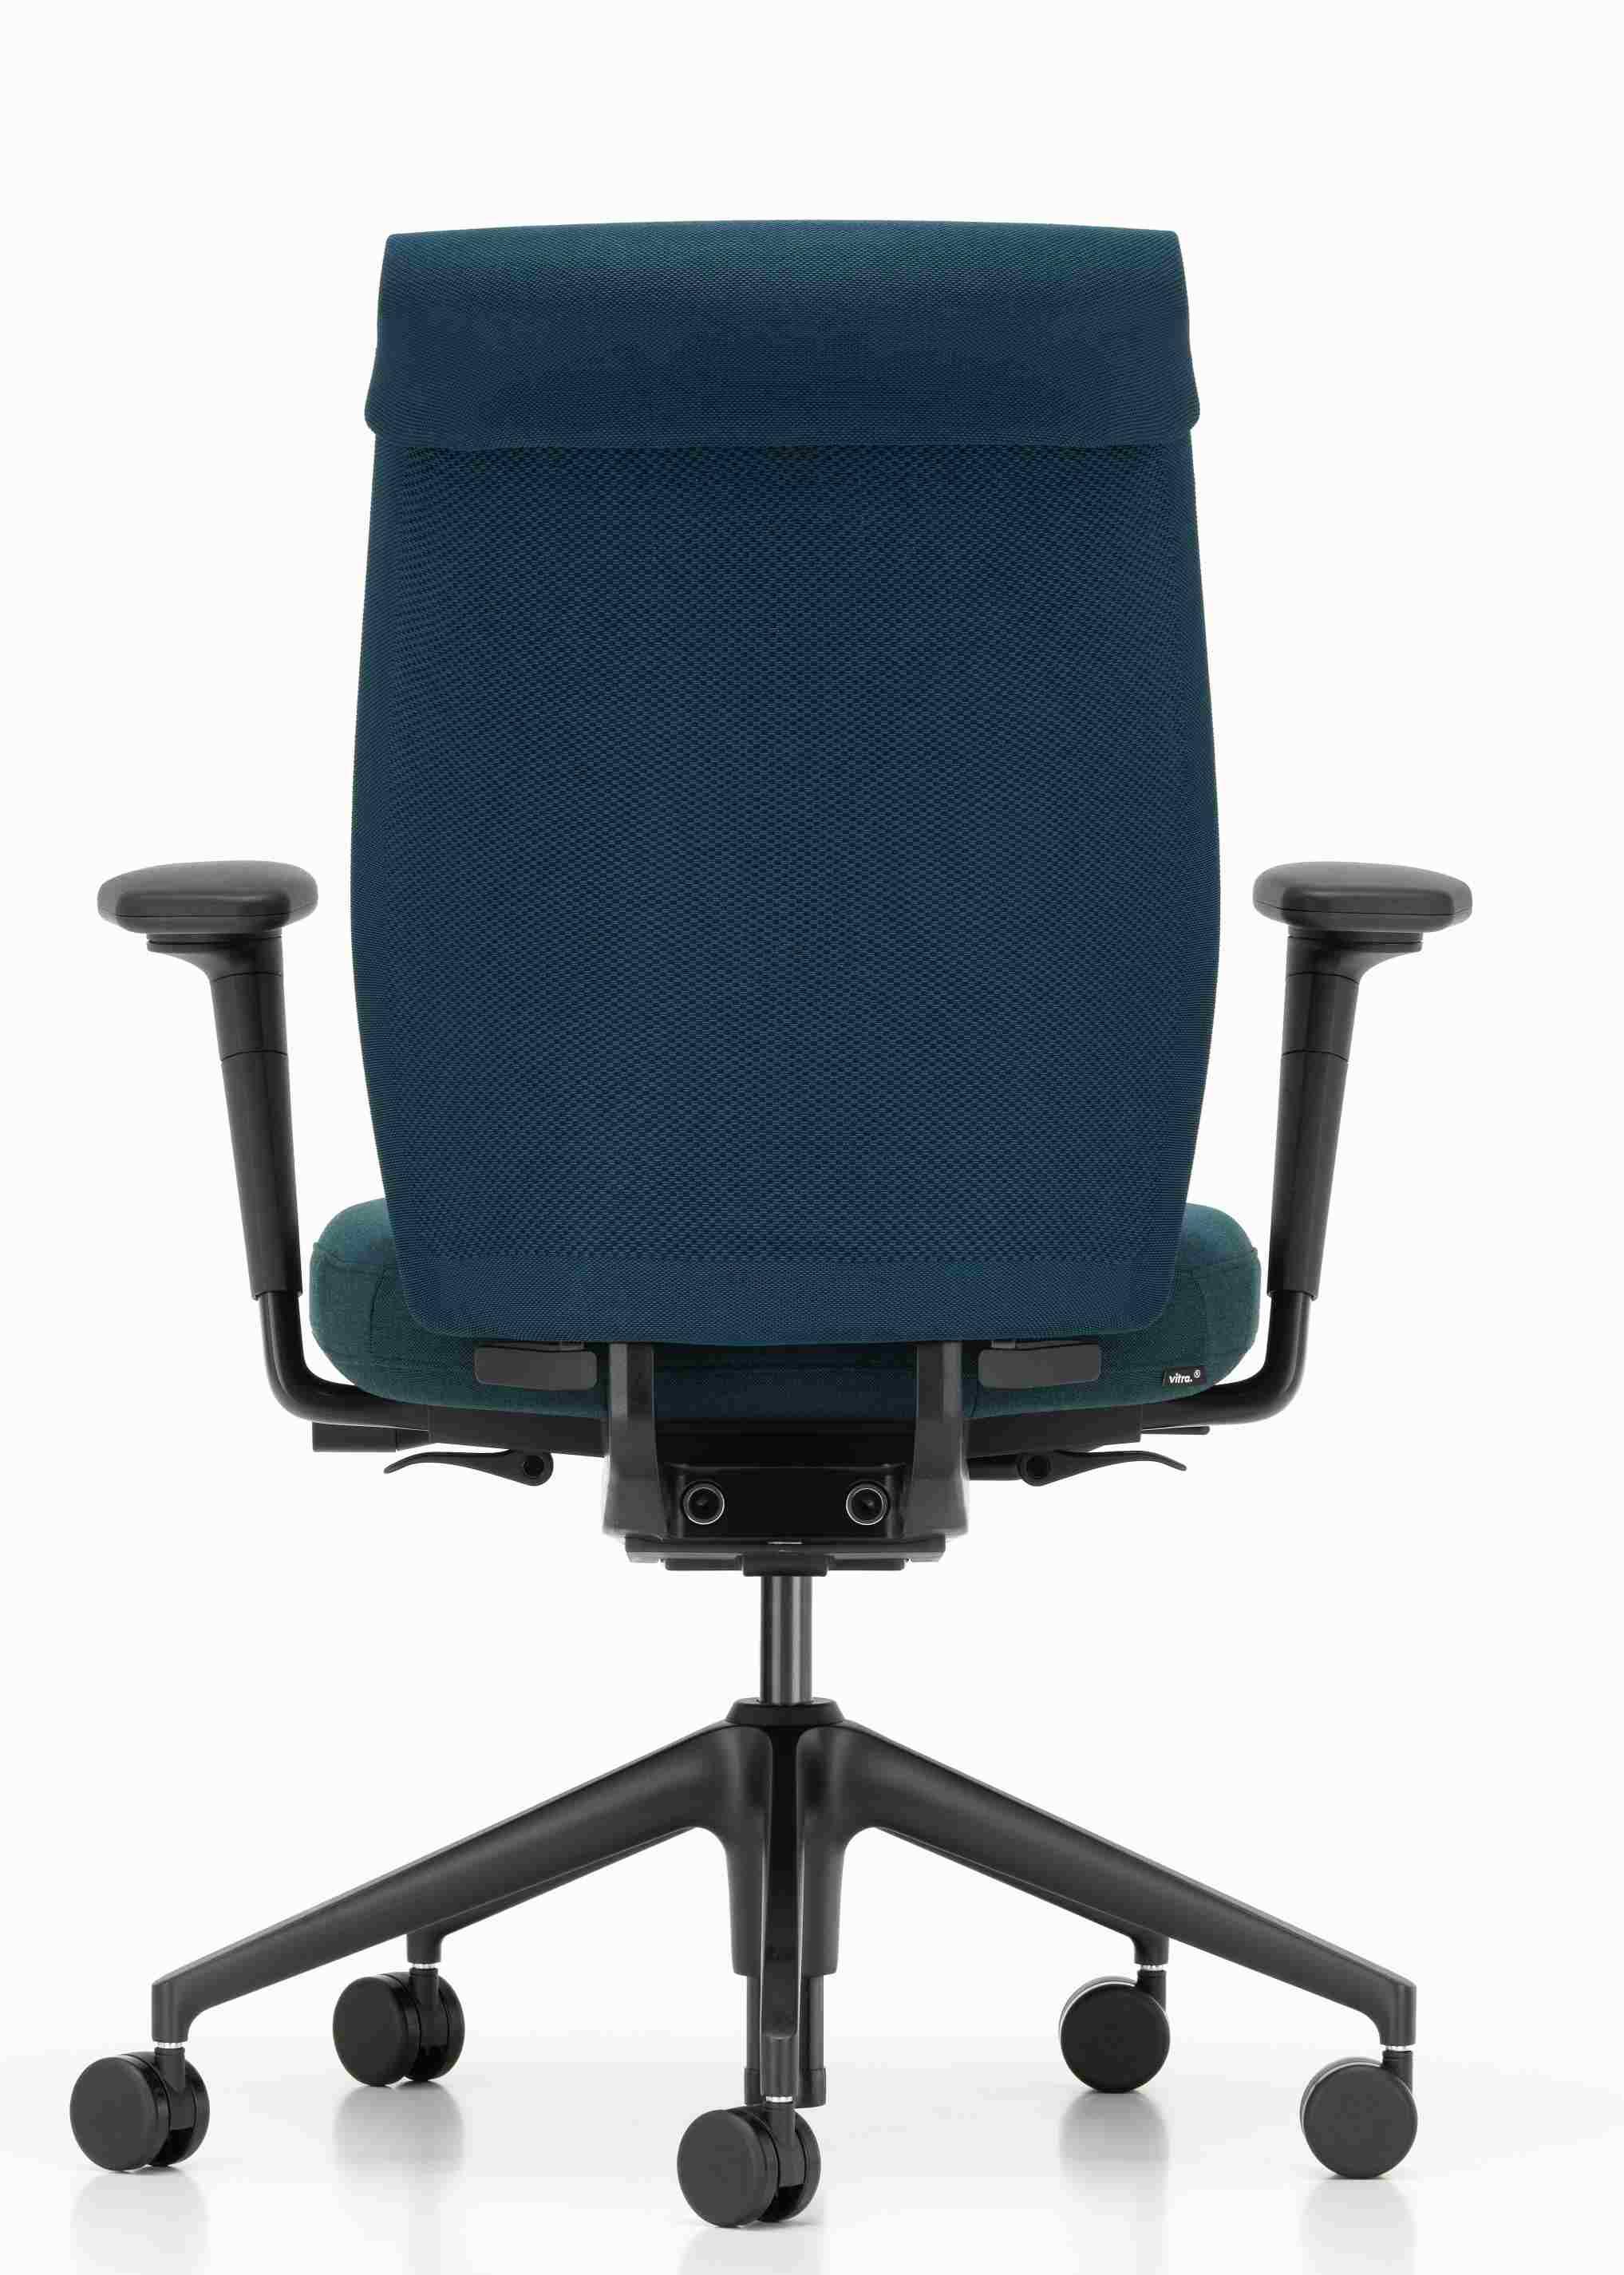 ID Cloud Office Swivel Chair Vitra